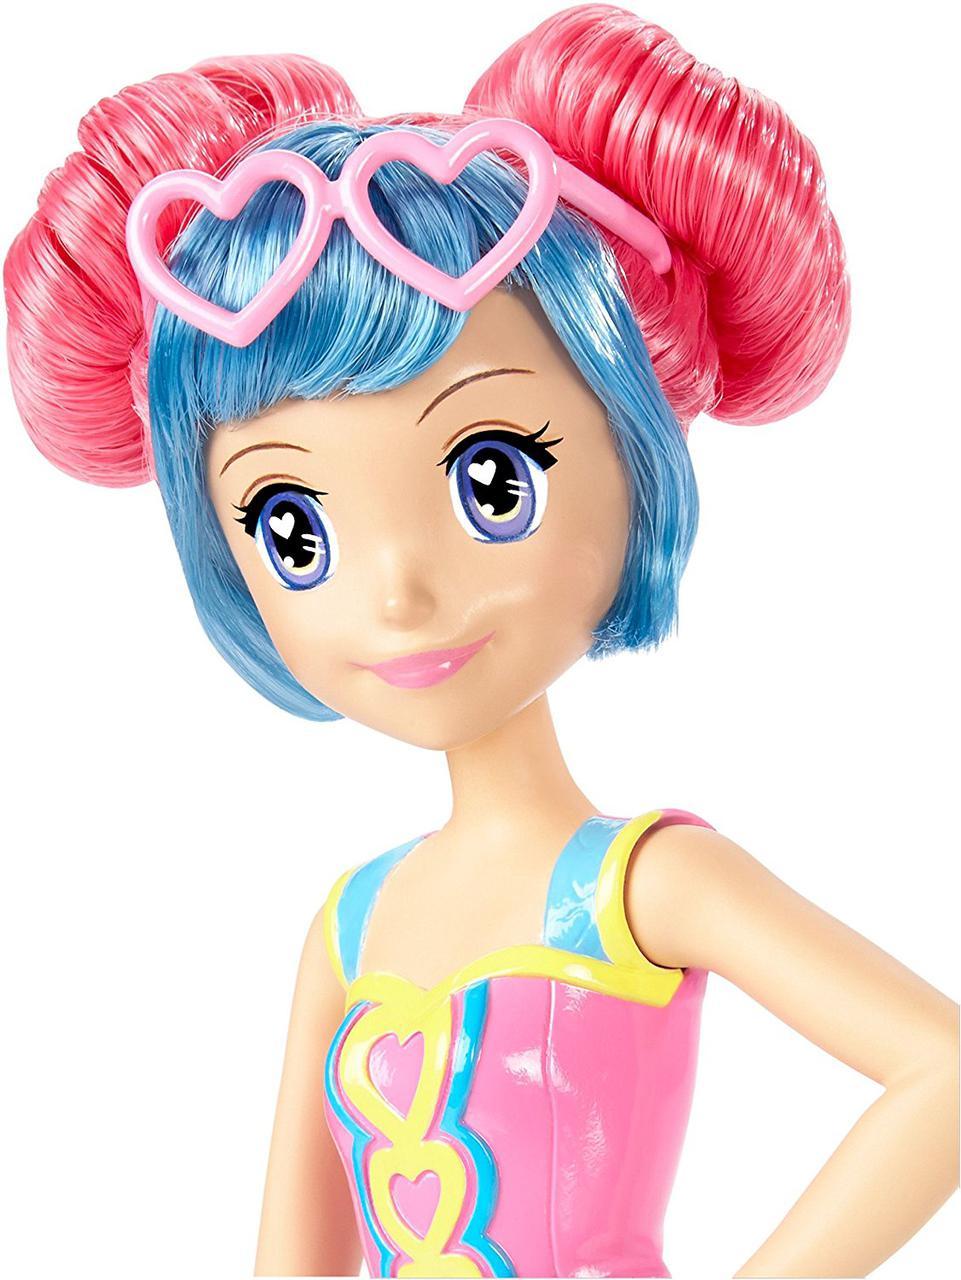 4e8897baa632 ... фото · Barbie Кукла Героиня Видеоигры в розовых очках Barbie Video Game  Hero Pink Eyeglasses Doll